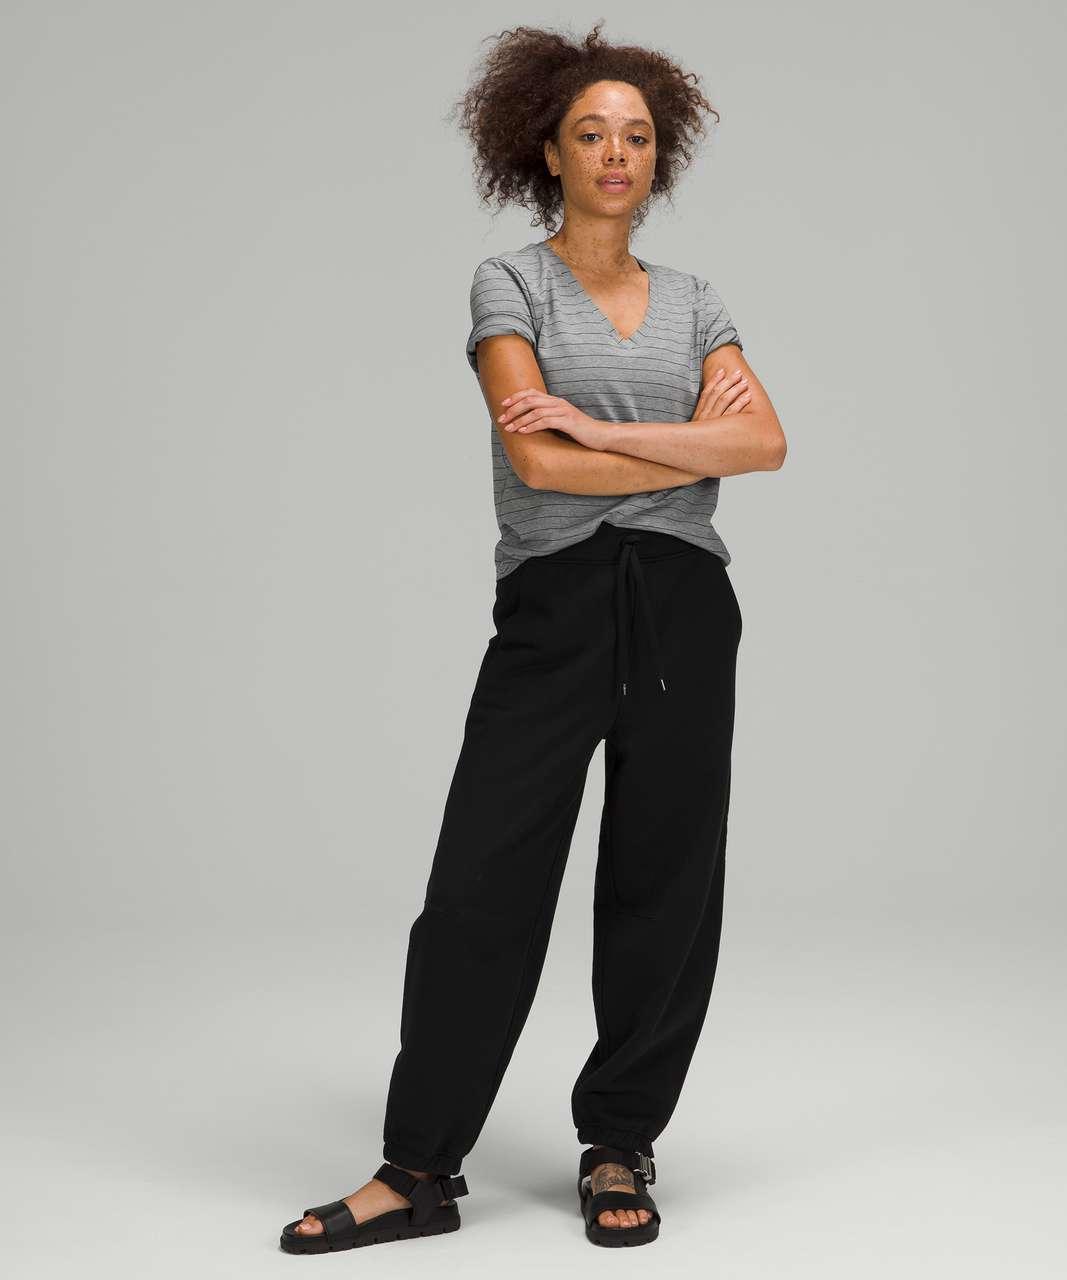 Lululemon Love Tee Short Sleeve V-Neck T-Shirt - Short Serve Stripe Heathered Medium Grey Black